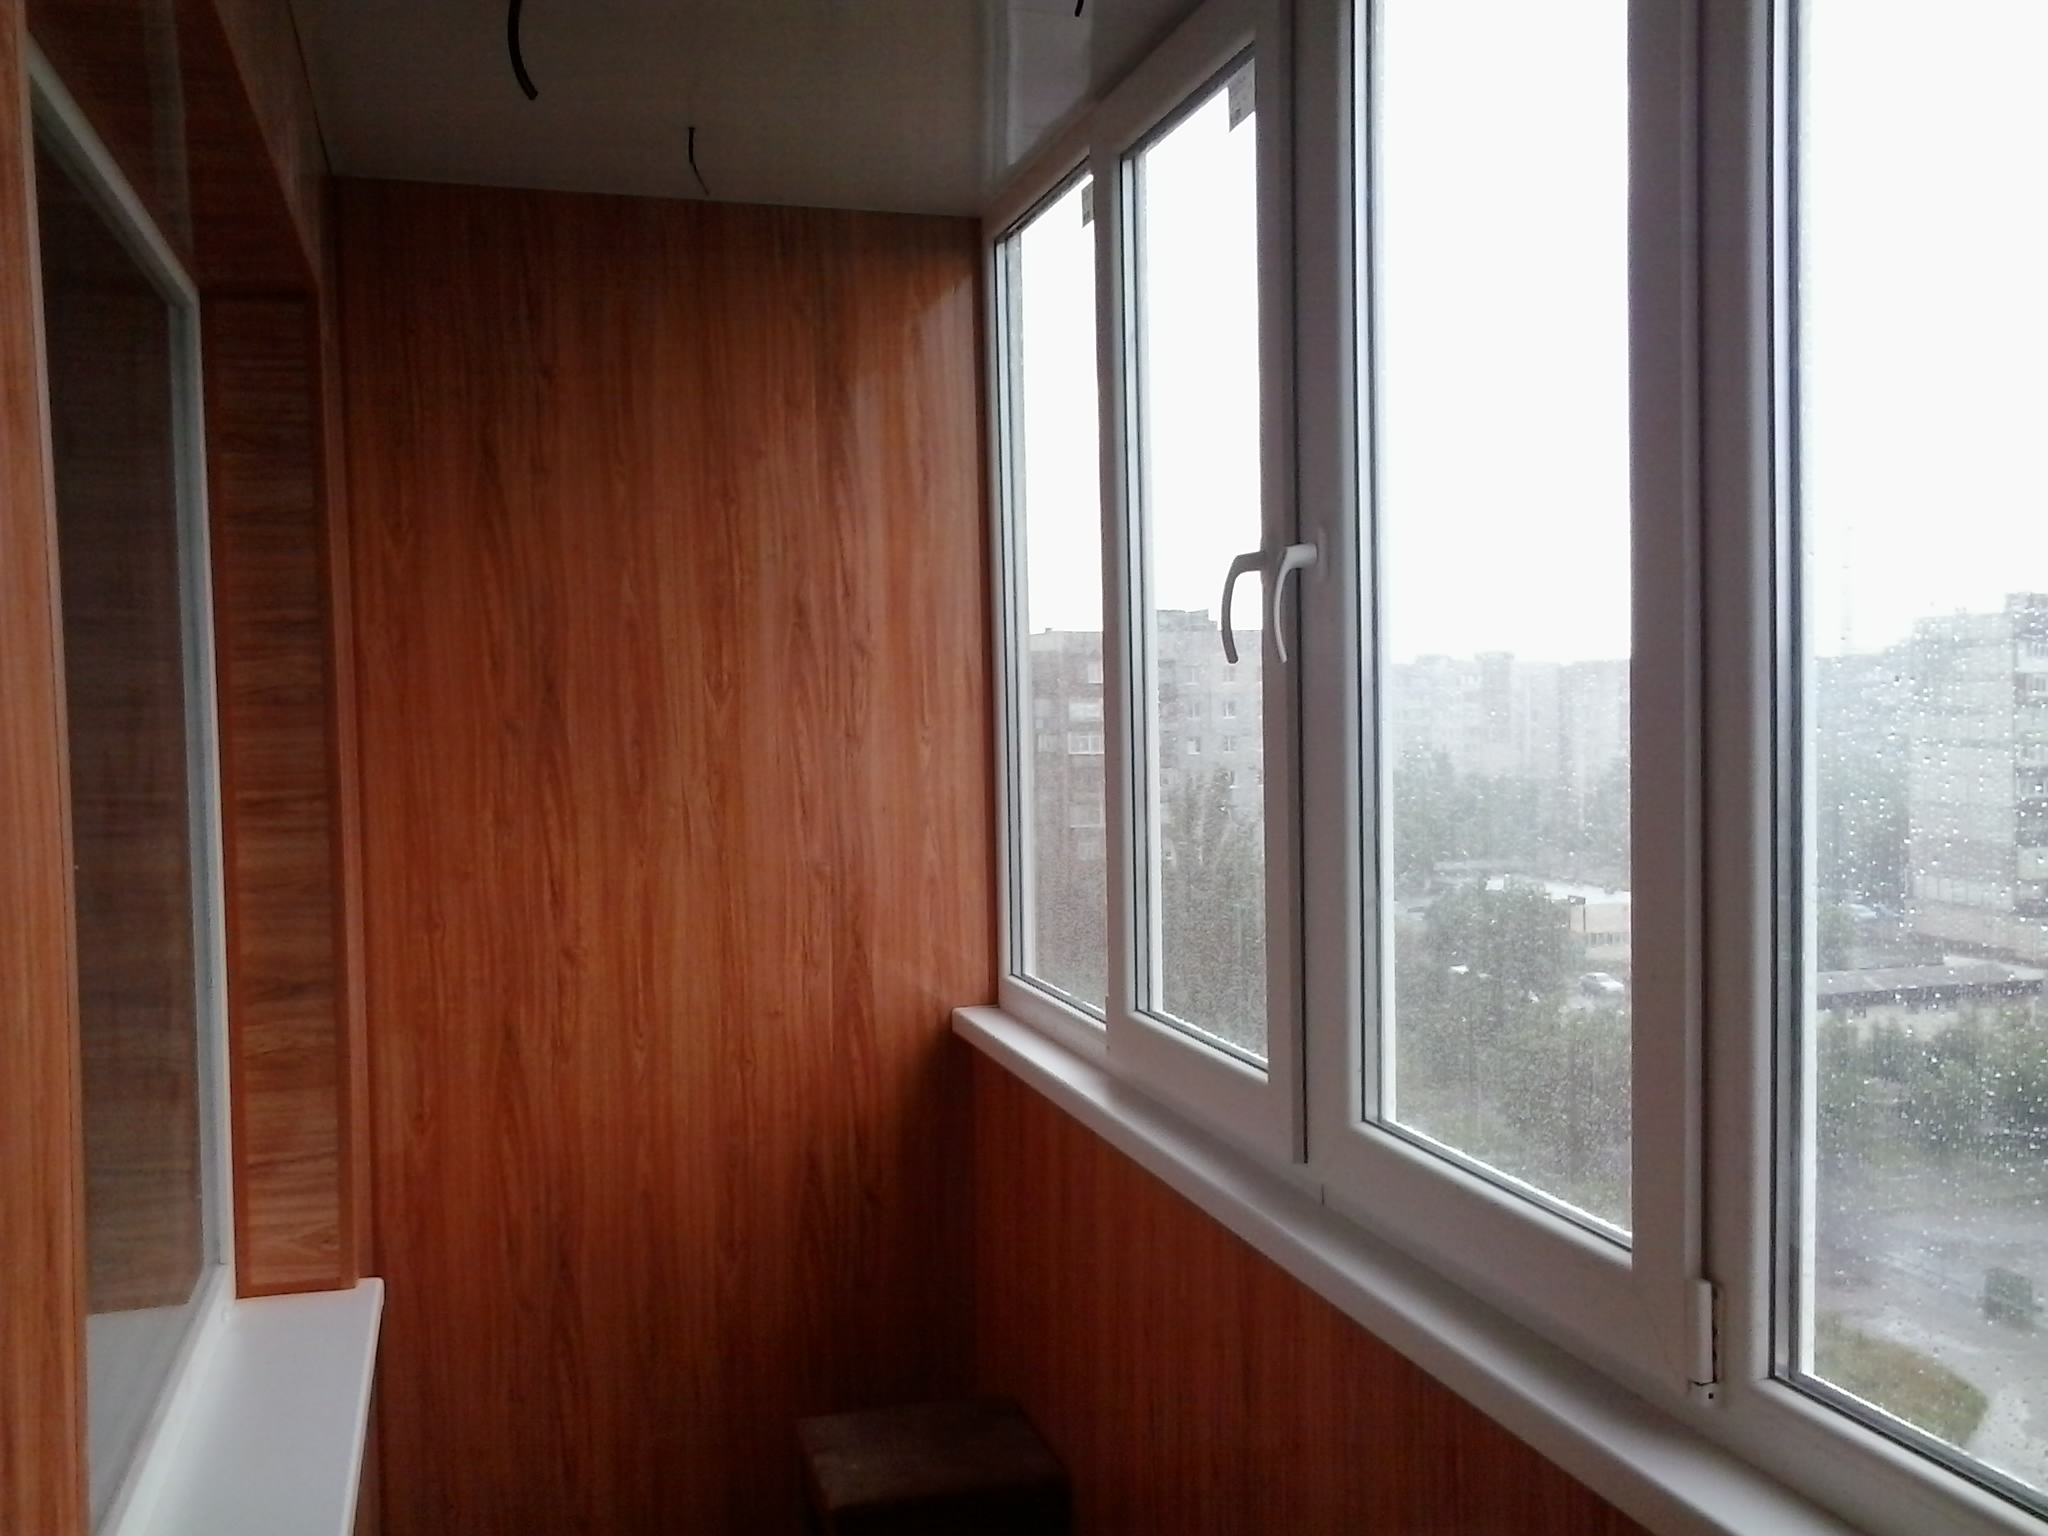 отделка балкона пластиковыми панелями фото дизайн